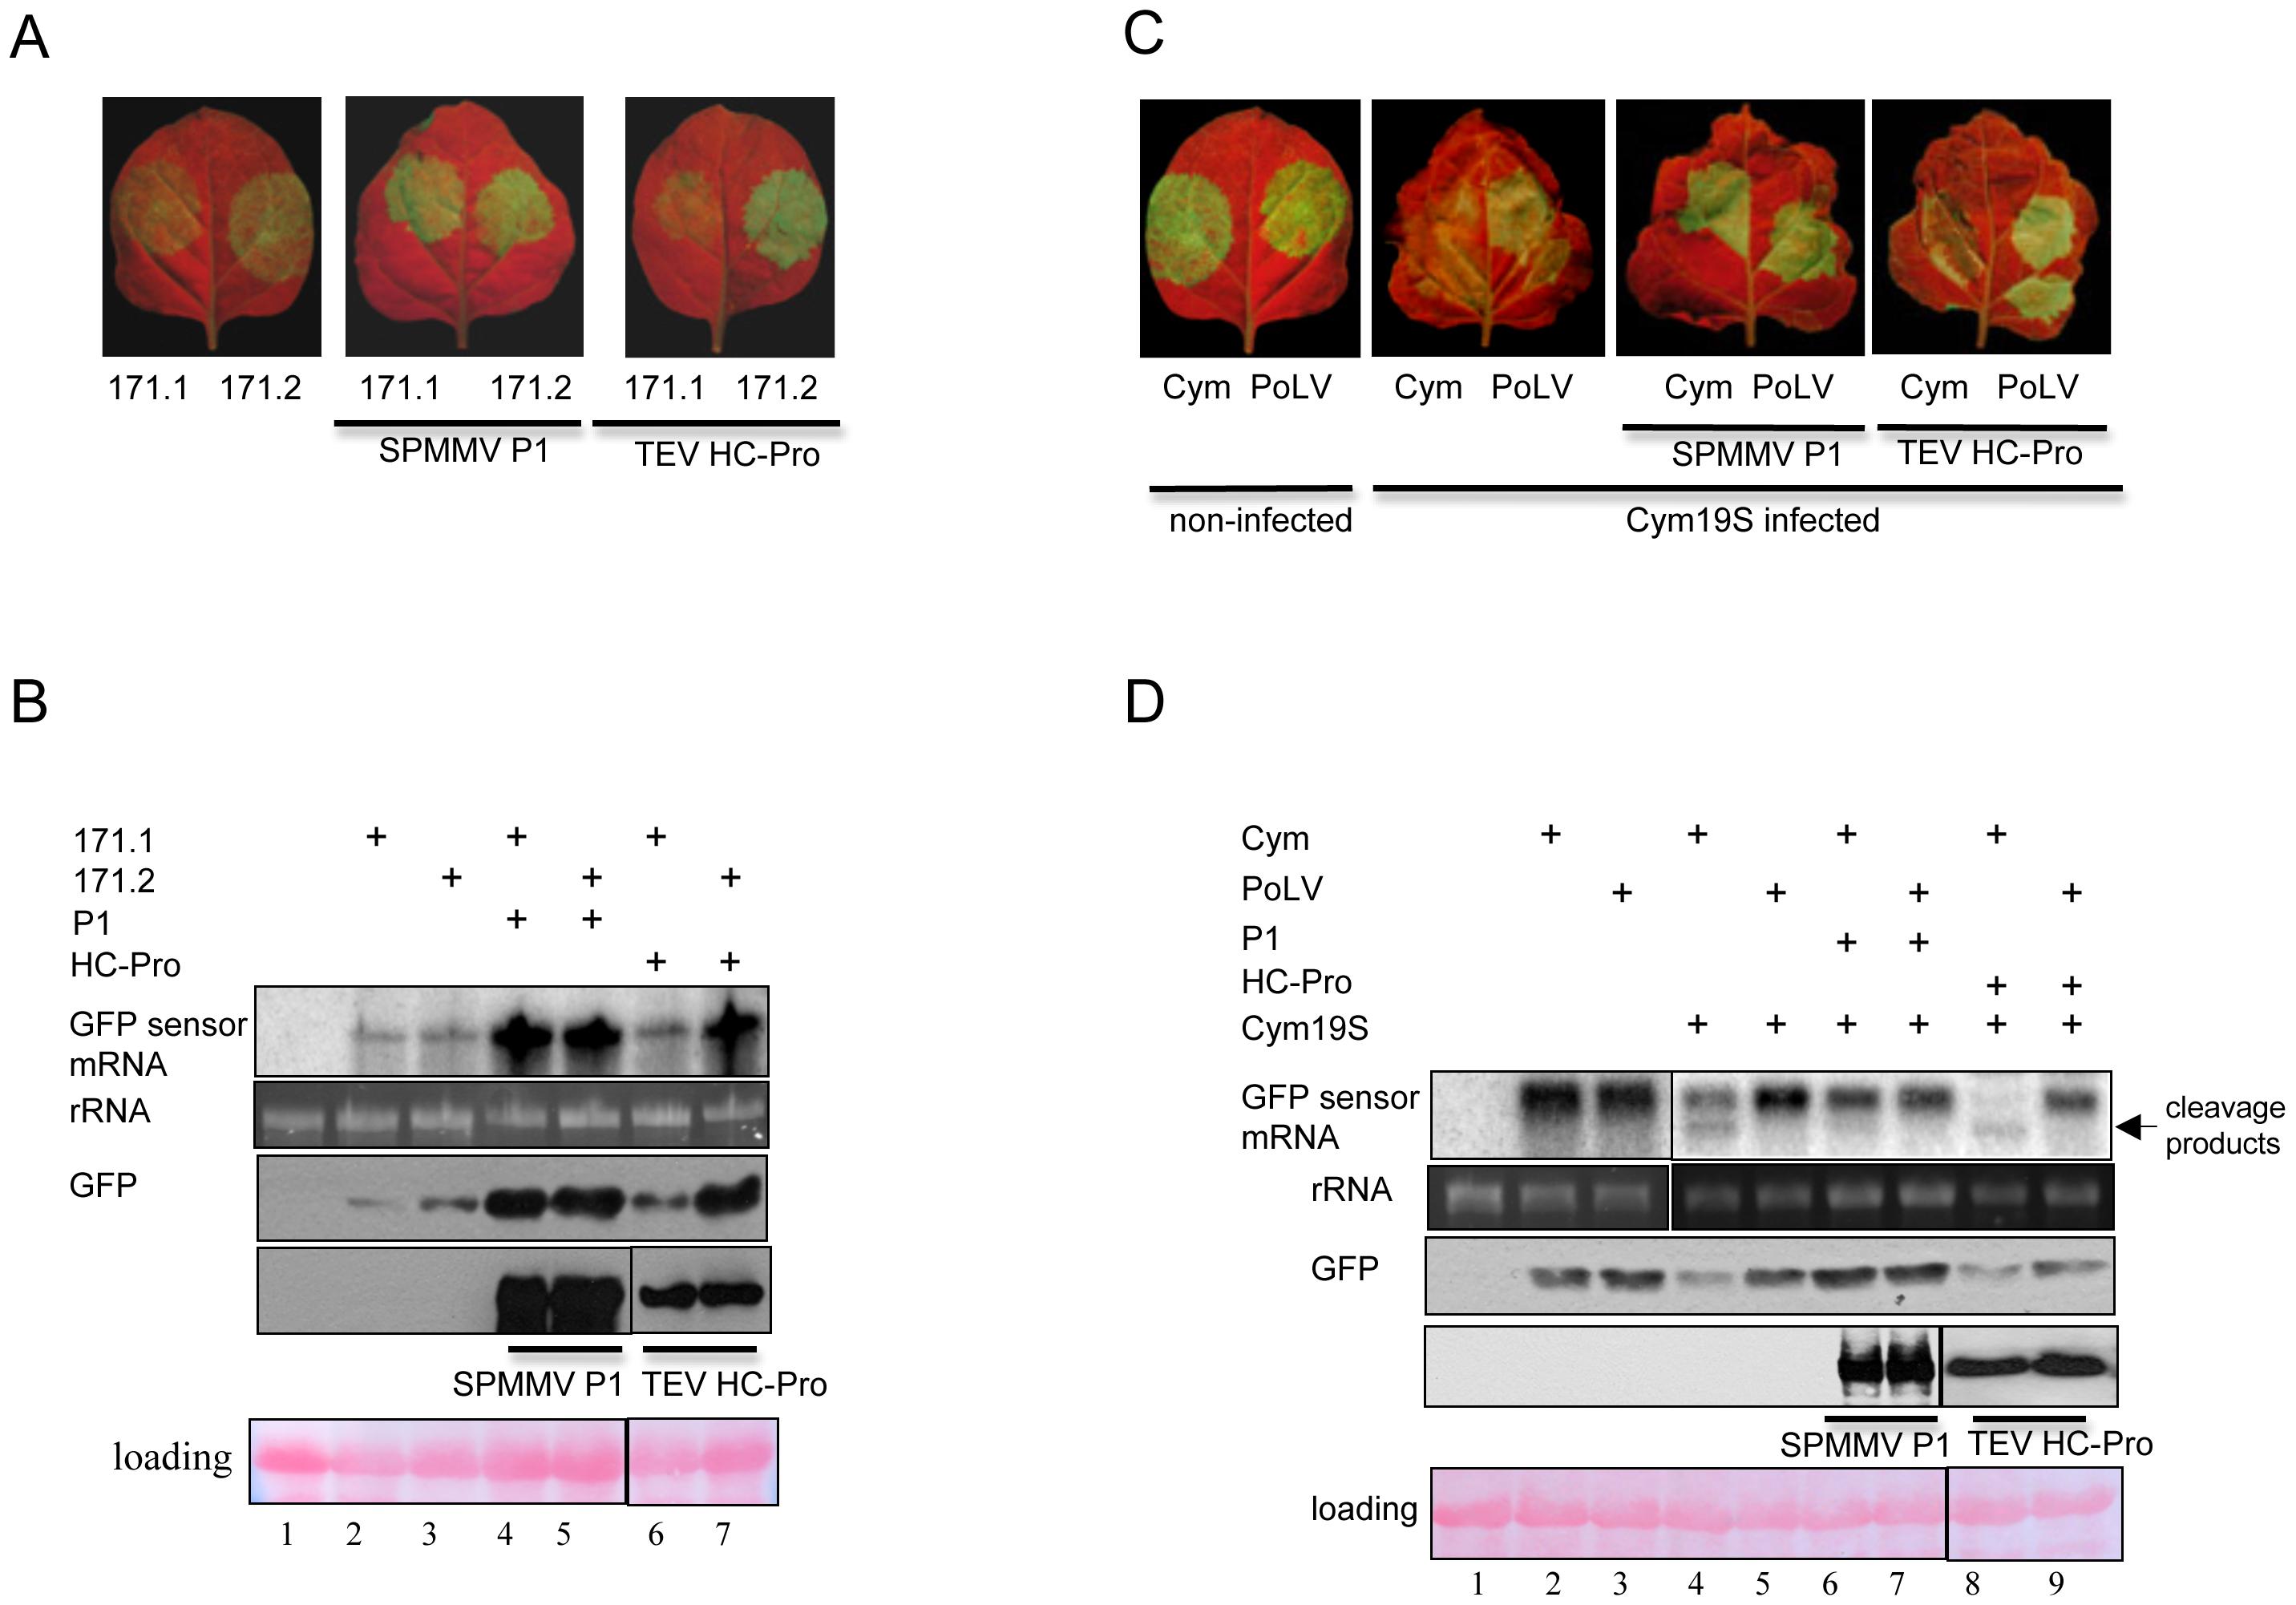 SPMMV P1 inhibits miRNA and viral siRNA loaded RISCs.